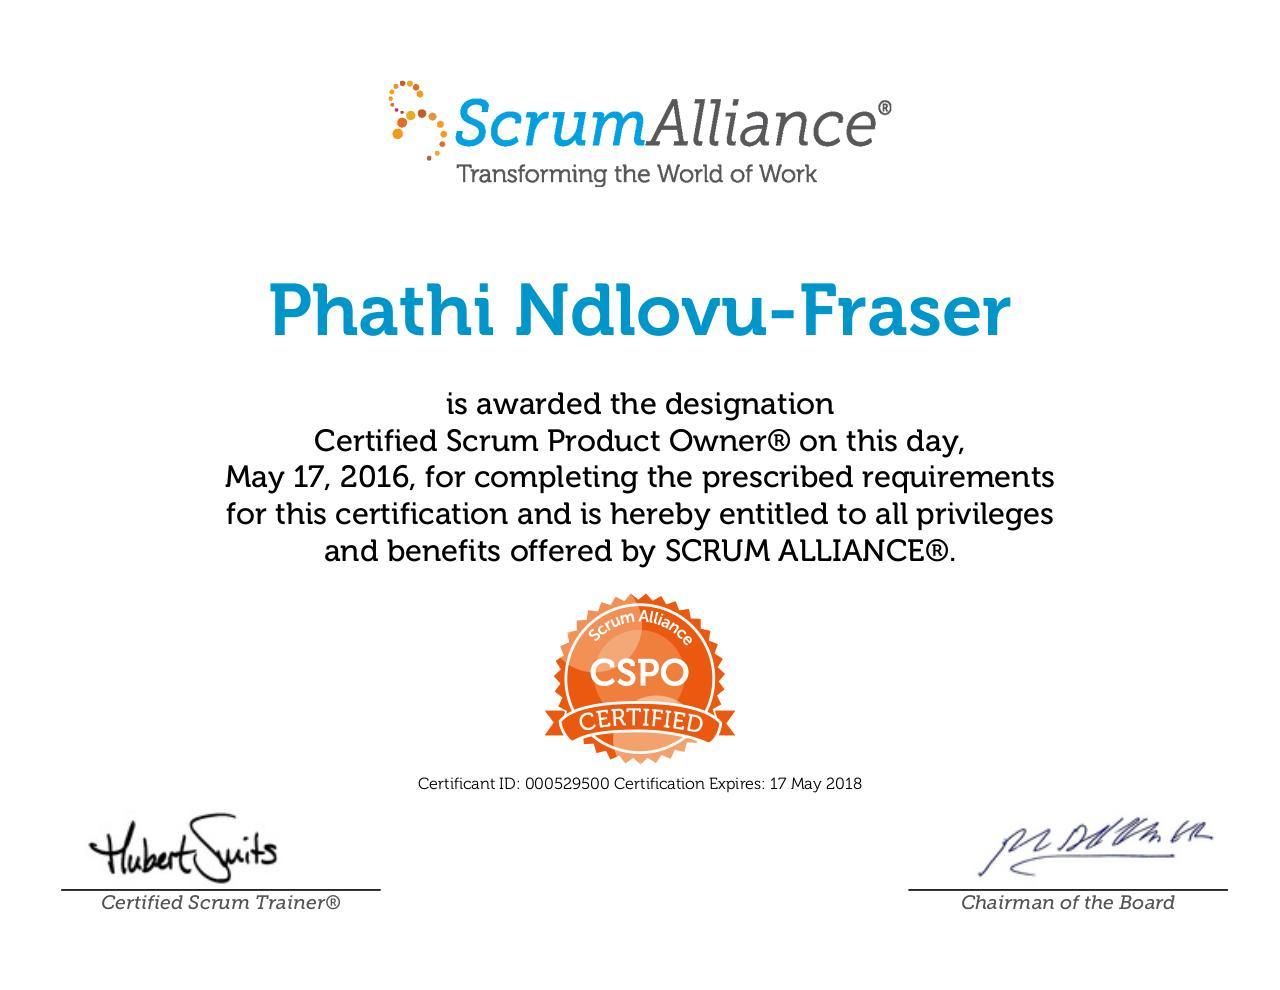 cspo pdf certificate ndlovu scrumalliance fraser scrum owner certified documents related